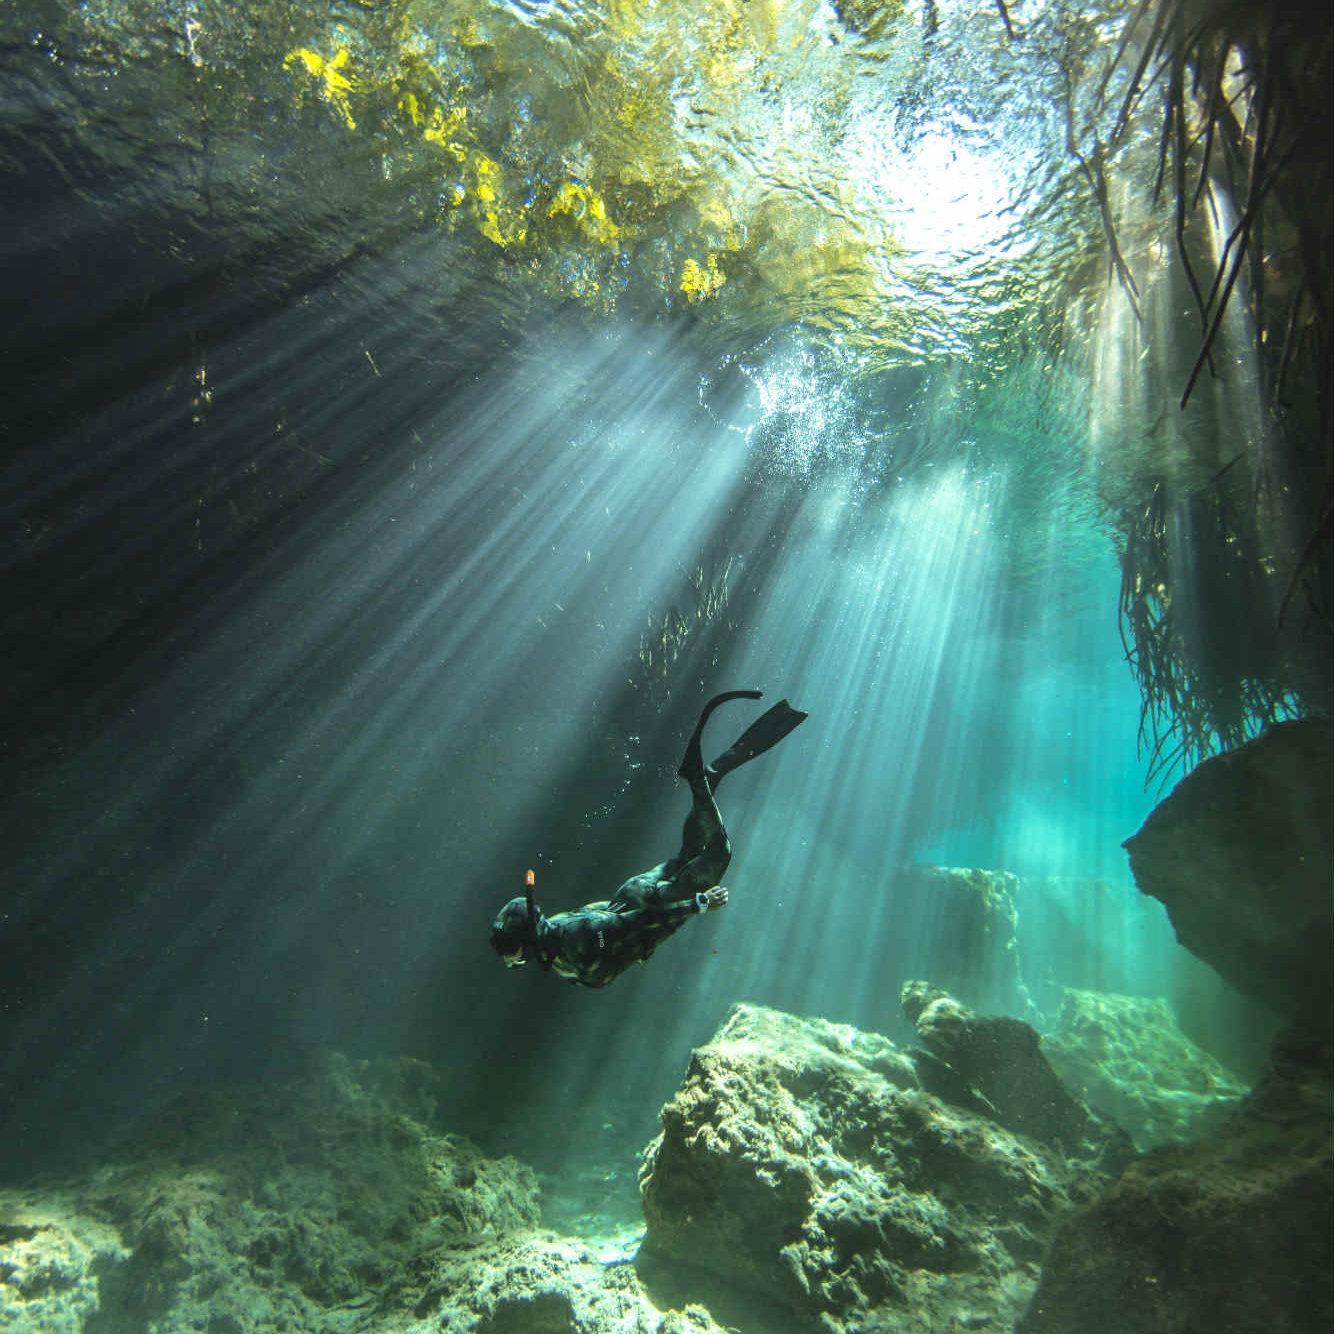 Freedive Experience